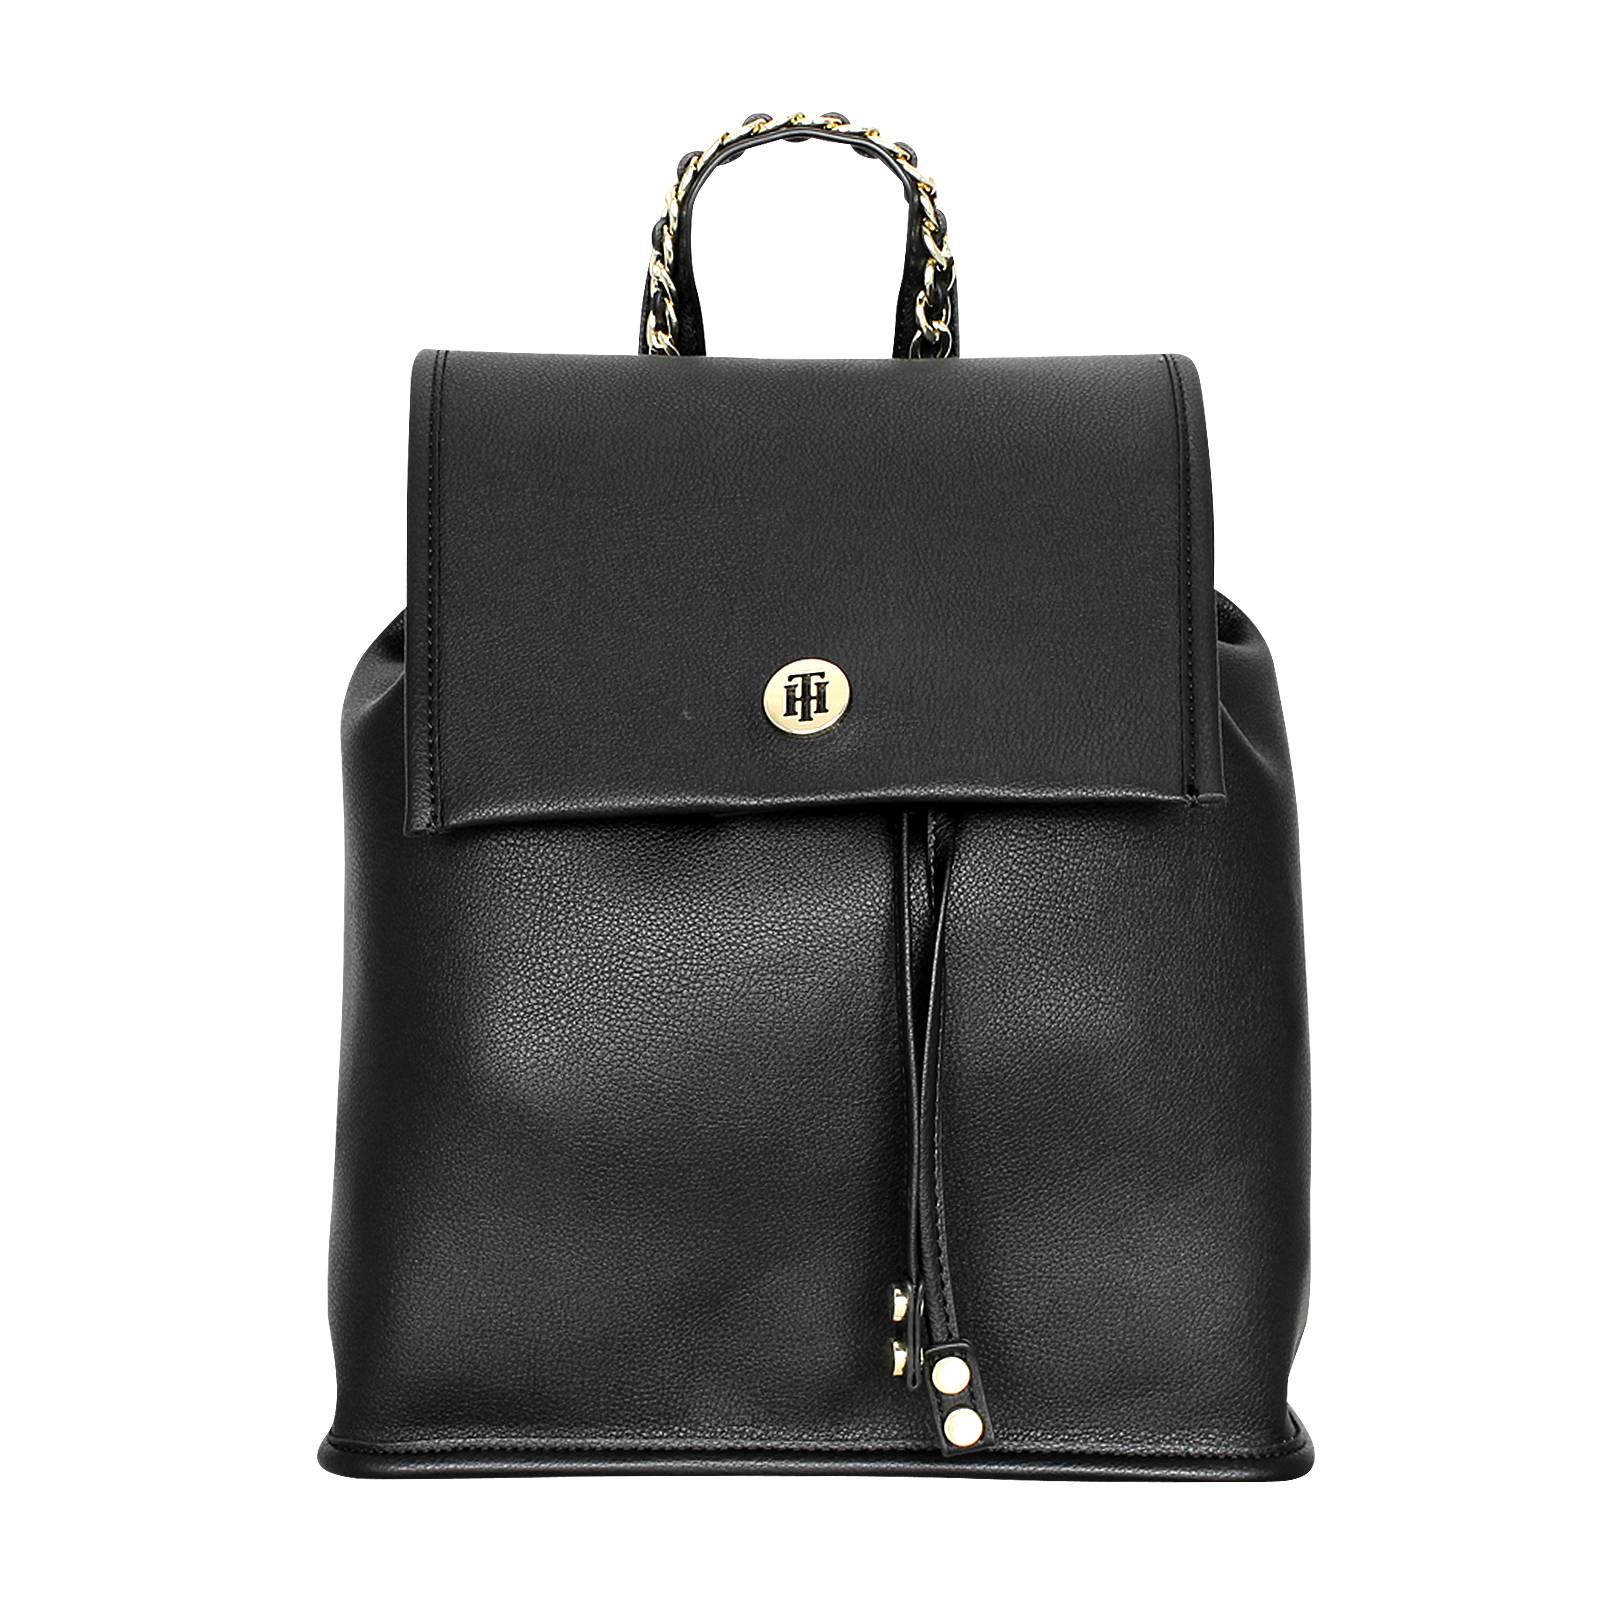 Chain Backpack - Γυναικεία τσάντα Tommy Hilfiger από δερμα συνθετικο ... 9a5448243f2